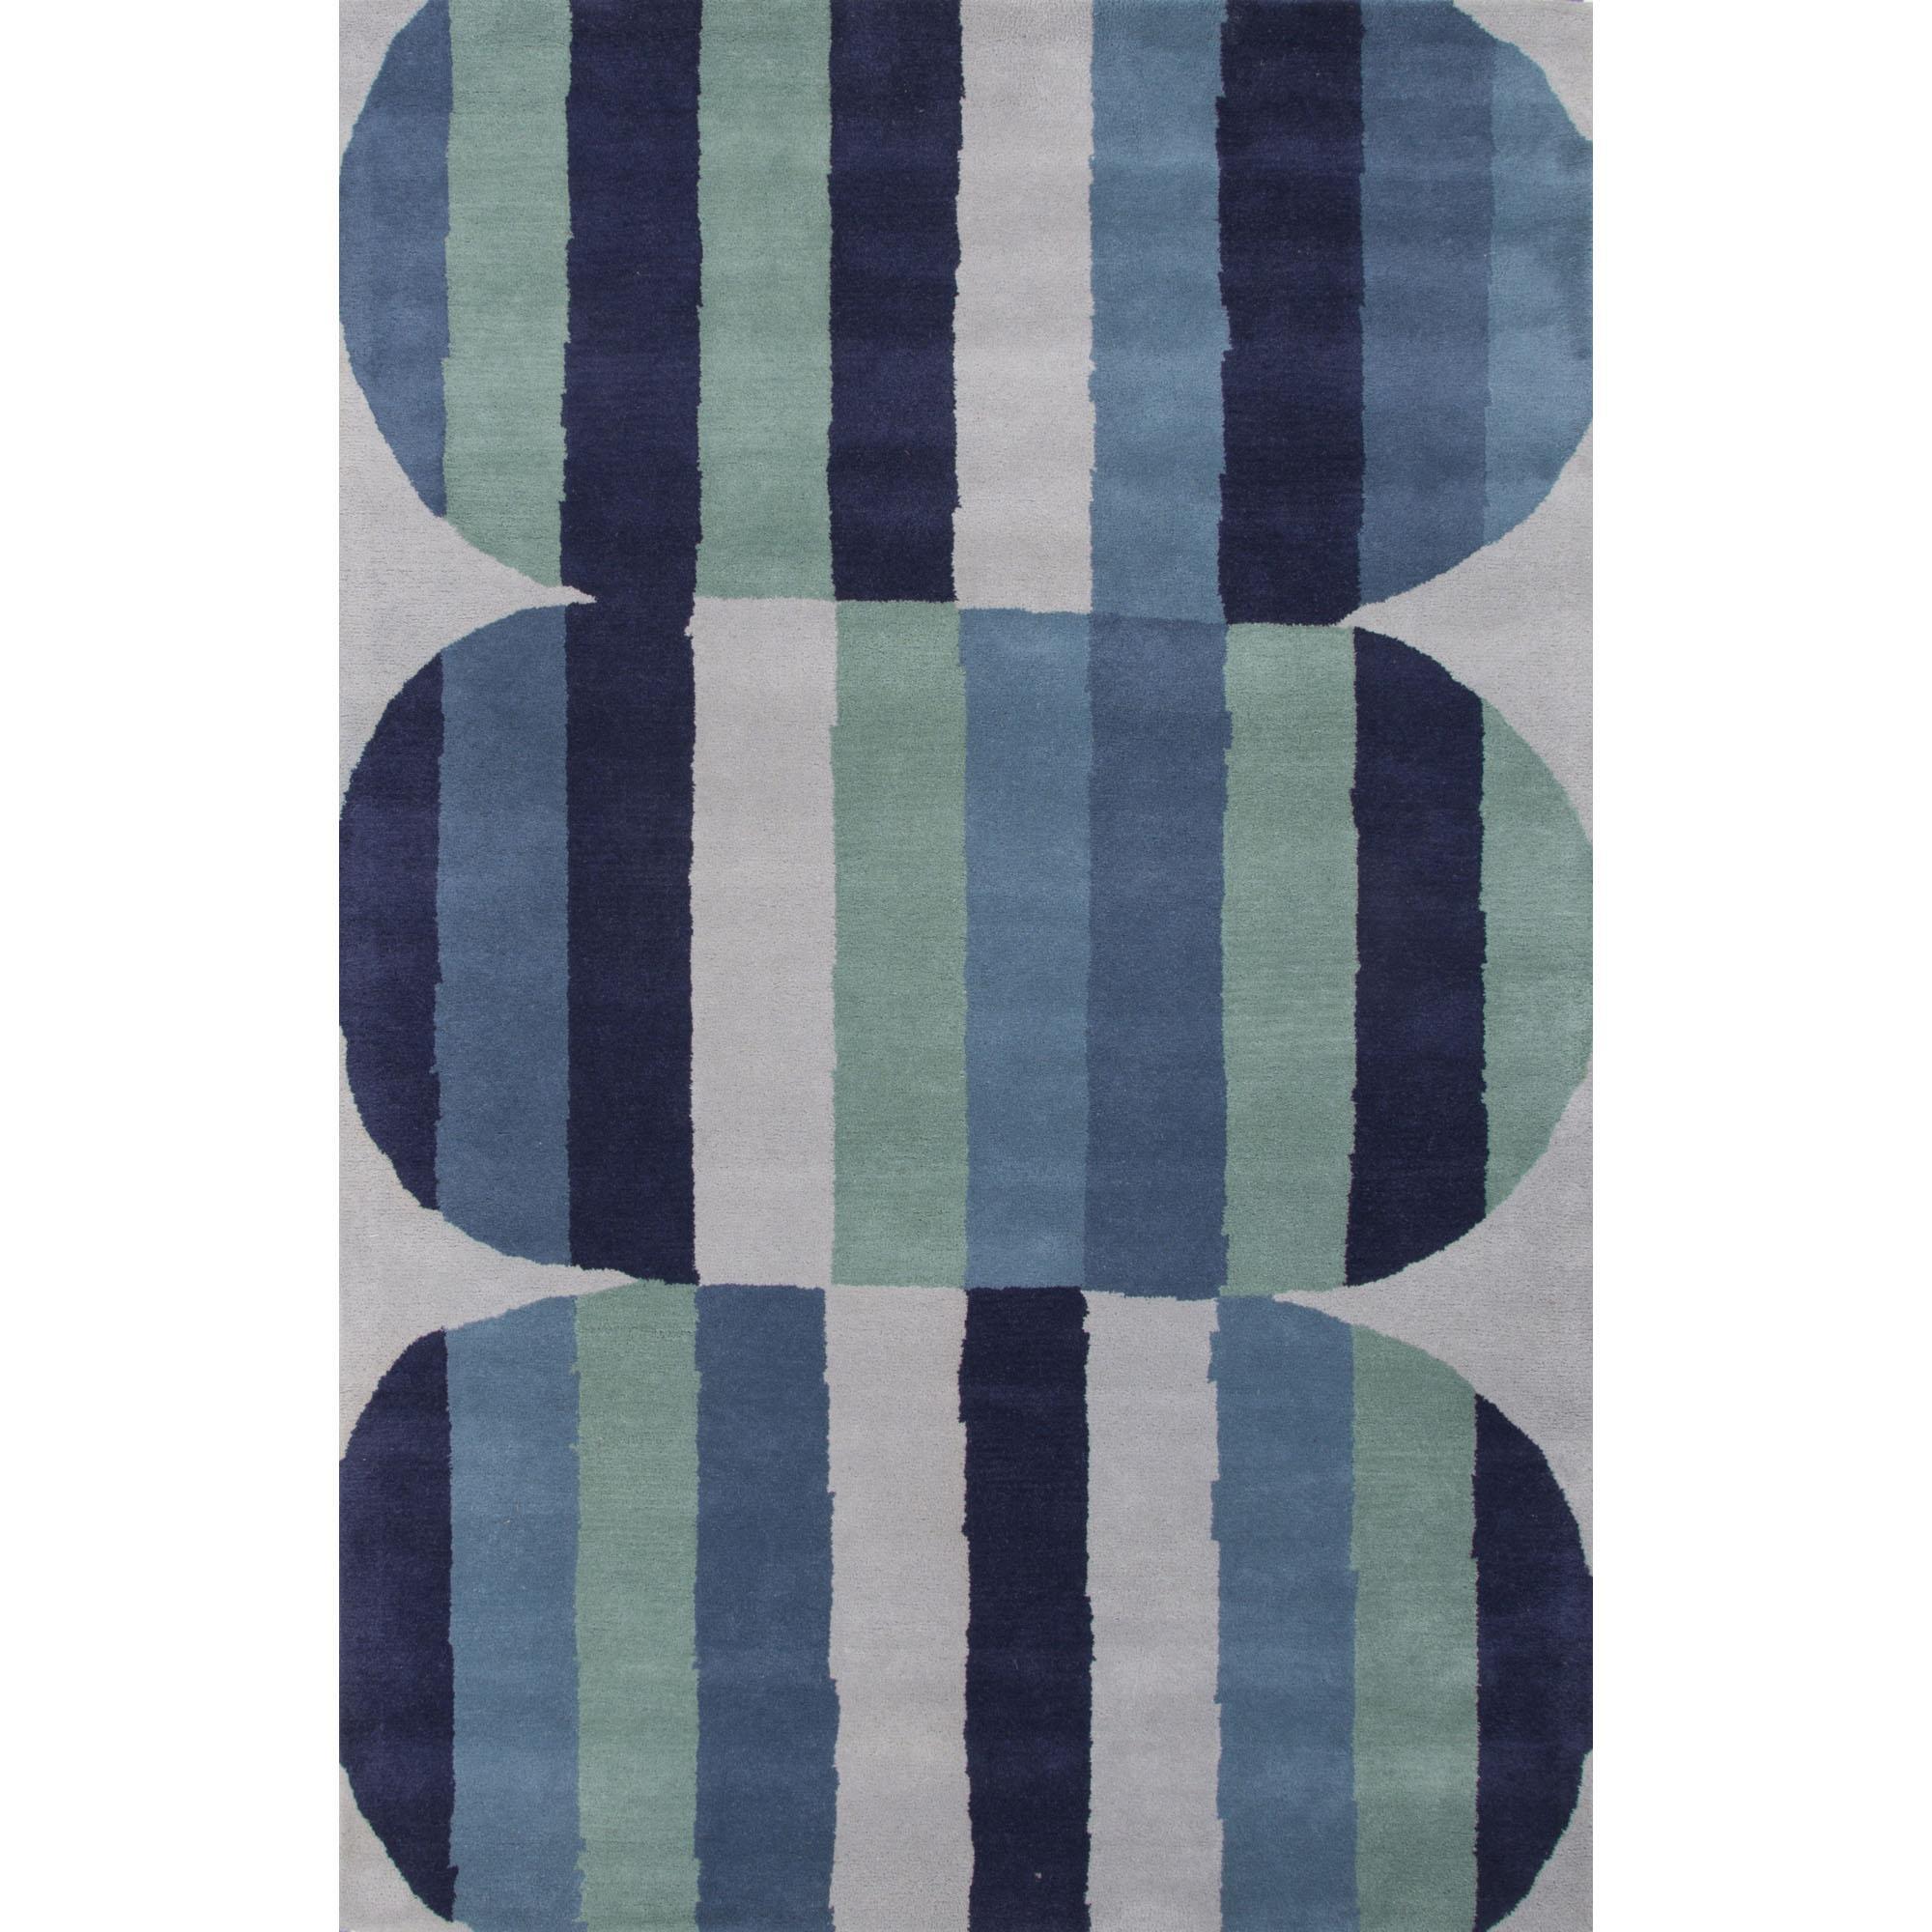 JAIPUR Rugs En Casa By Luli Sanchez Tufted 2 x 3 Rug - Item Number: RUG116778